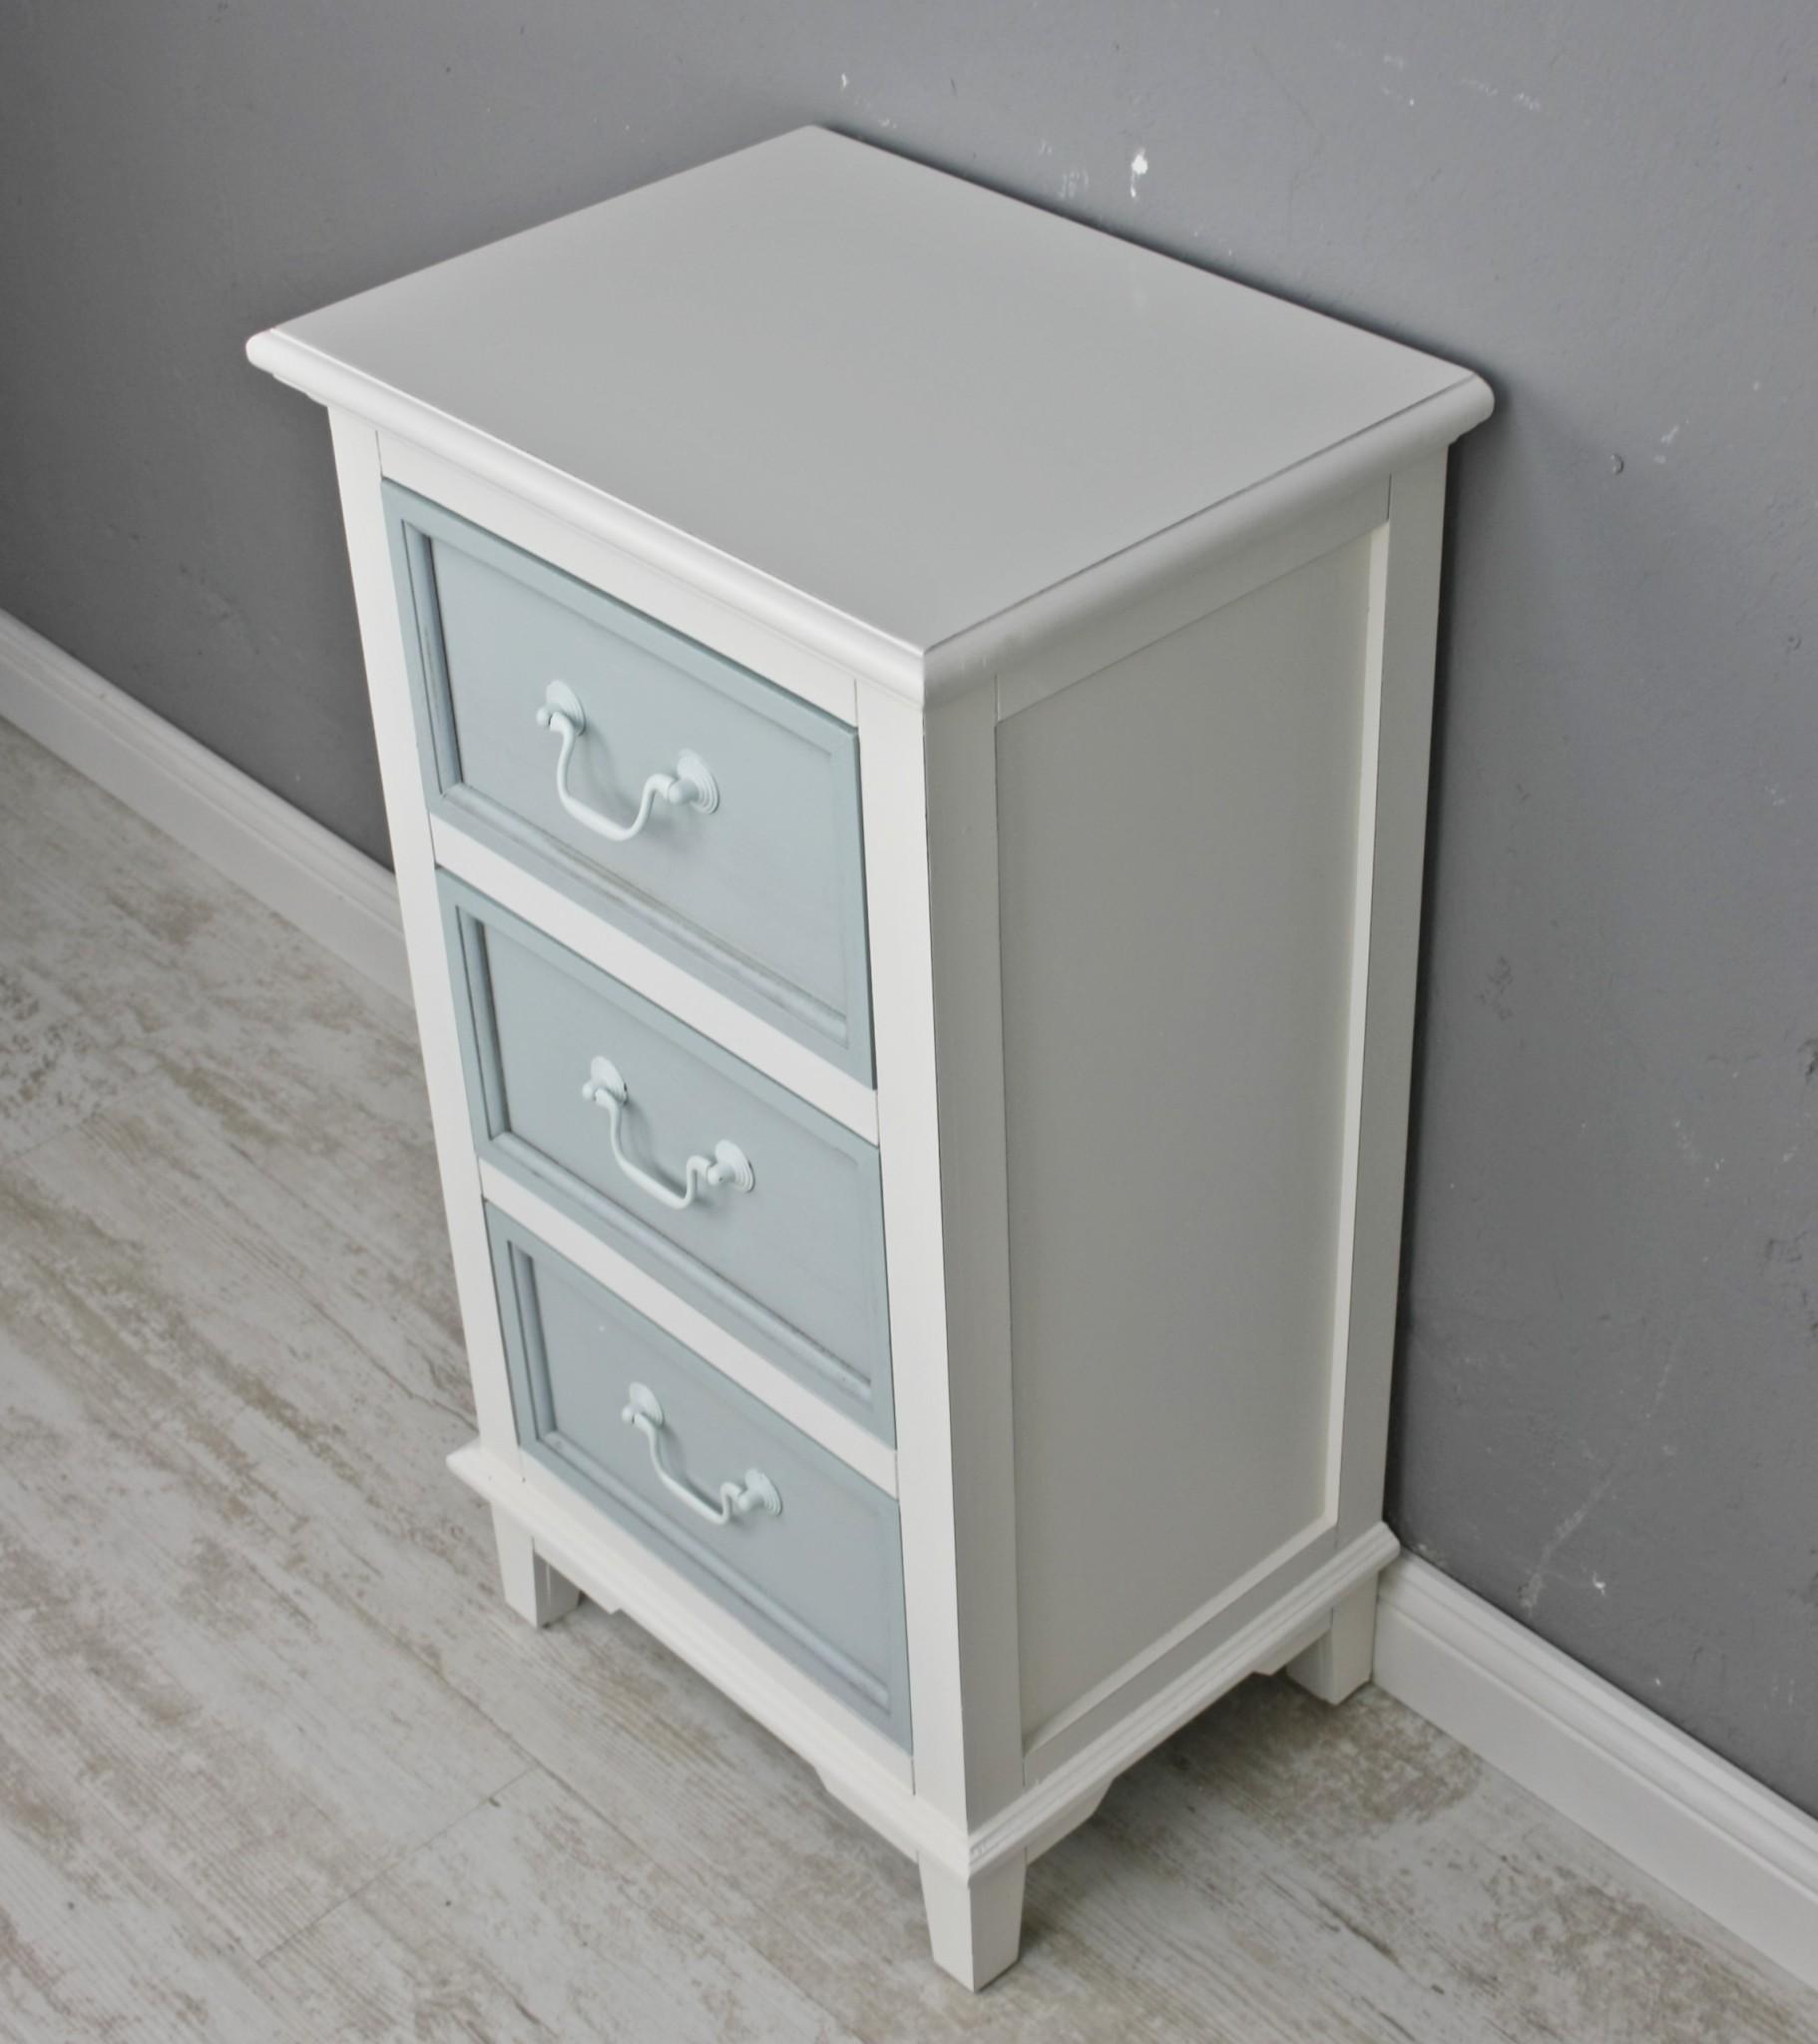 kommode wei schubladen inspirierendes design f r wohnm bel. Black Bedroom Furniture Sets. Home Design Ideas